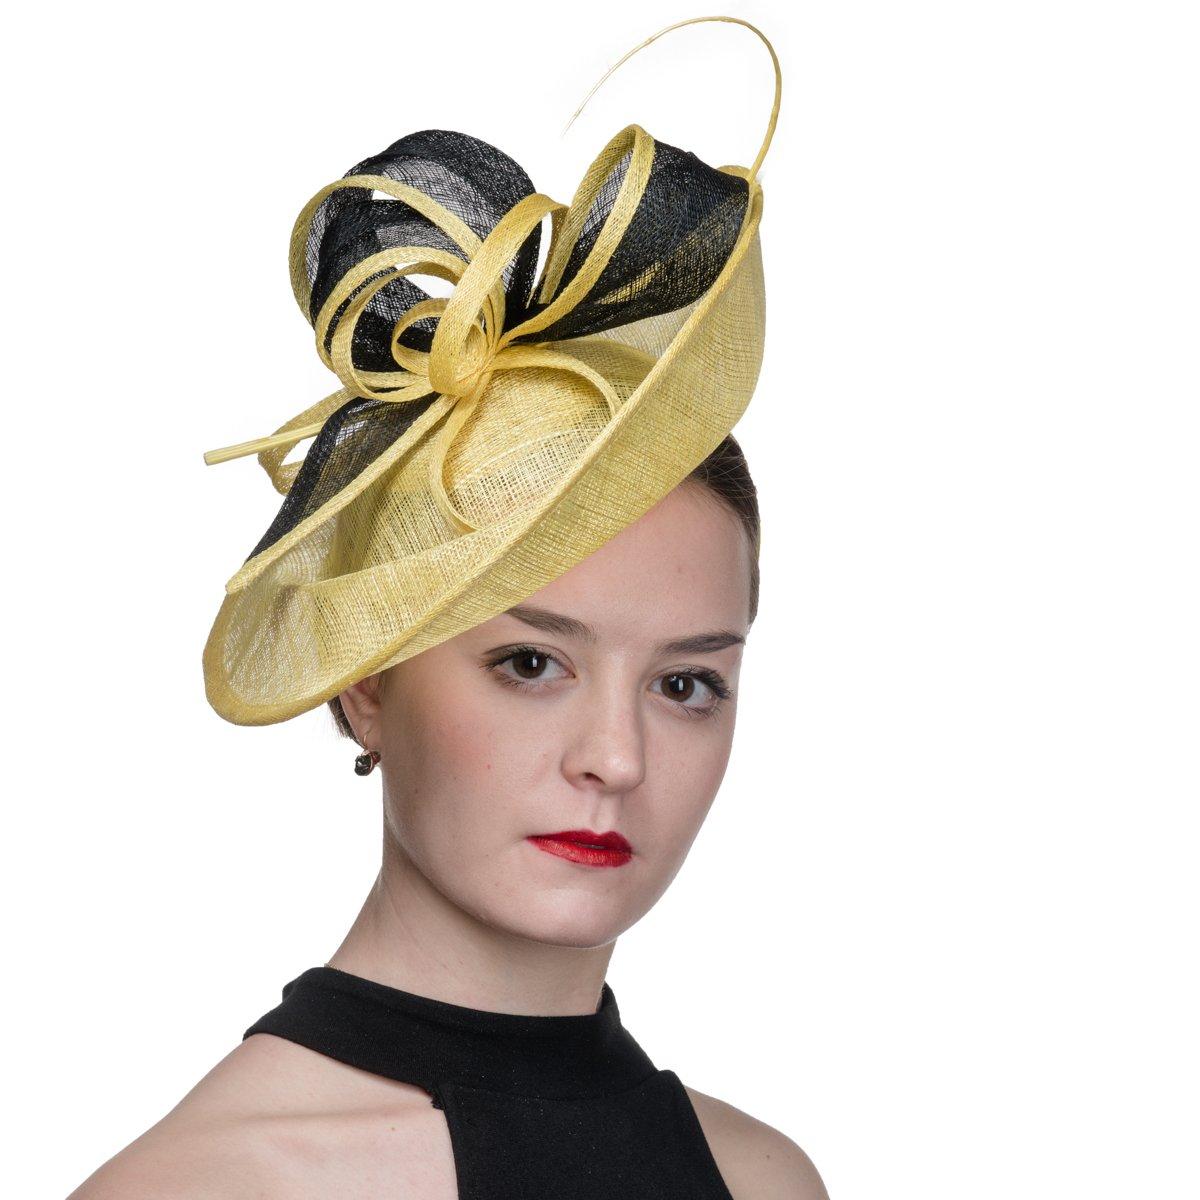 KaKyCo 102059-2 Tone Sinamary Headband Fascinator Cocktail Hats - Yelloe/Black